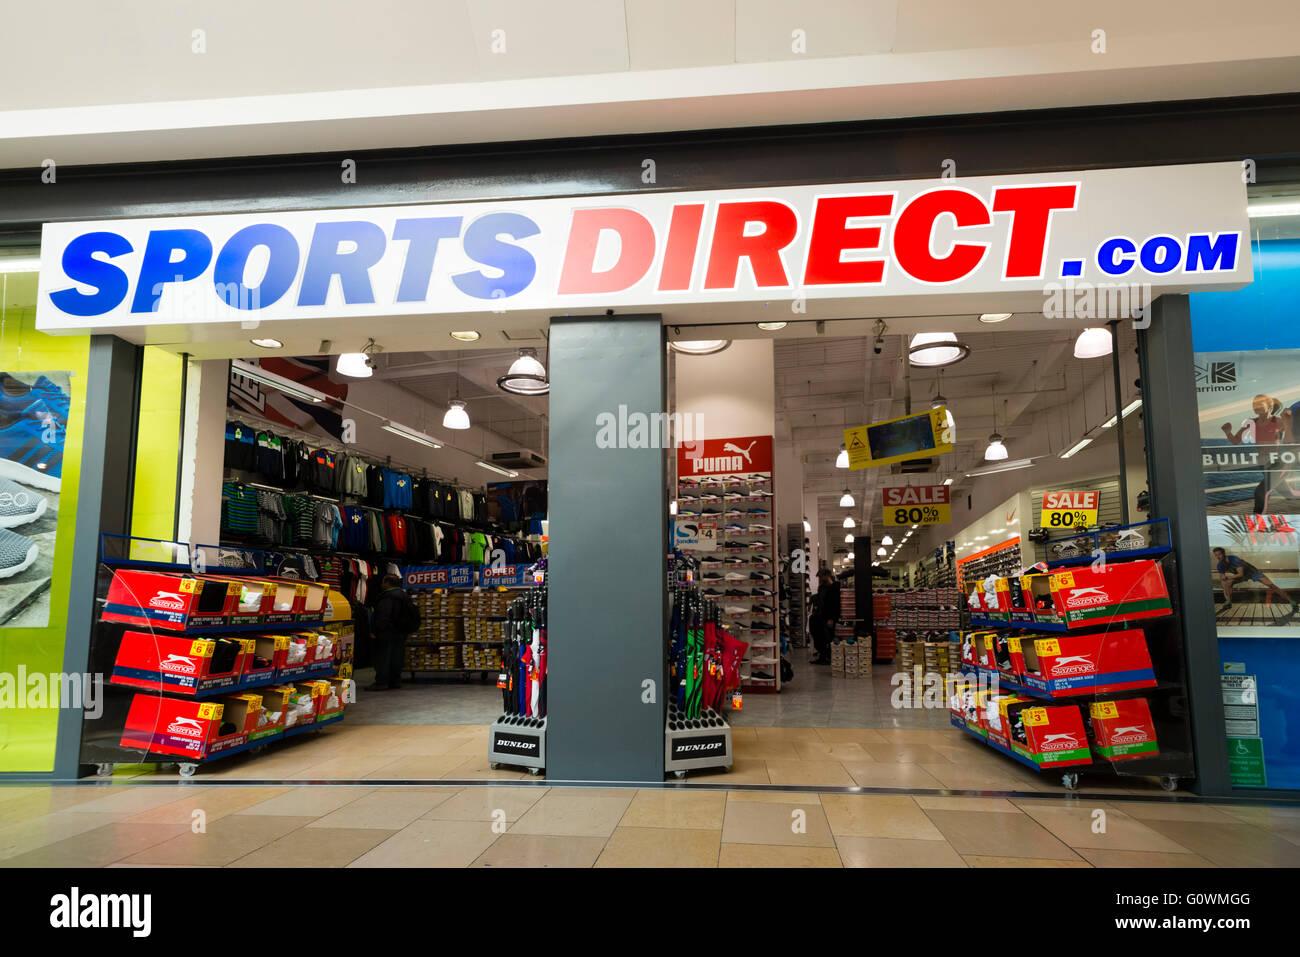 c9cbb3ffa1dd Sportsdirect Stock Photos   Sportsdirect Stock Images - Alamy